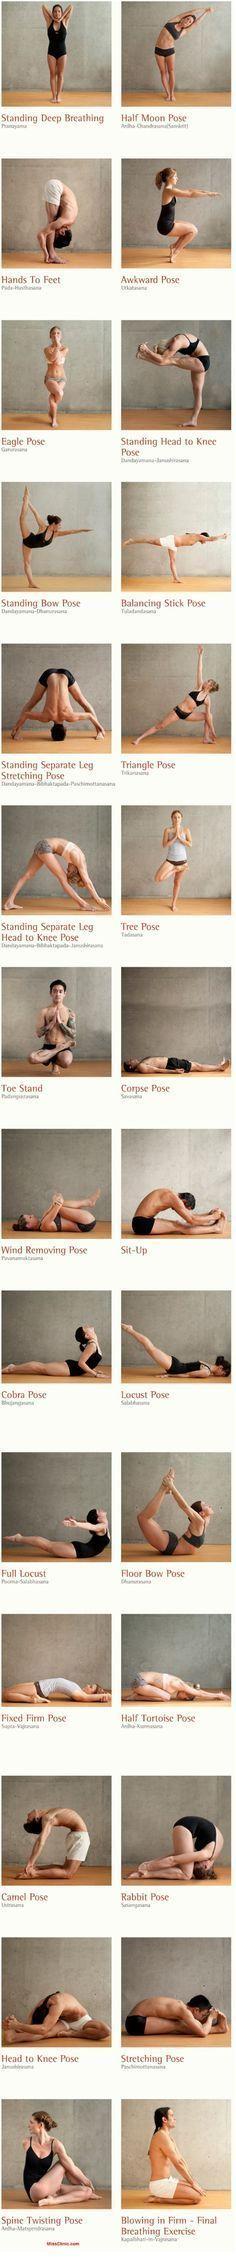 26 Healthy Yoga Postures #YoYoYoga-PosesandRoutines